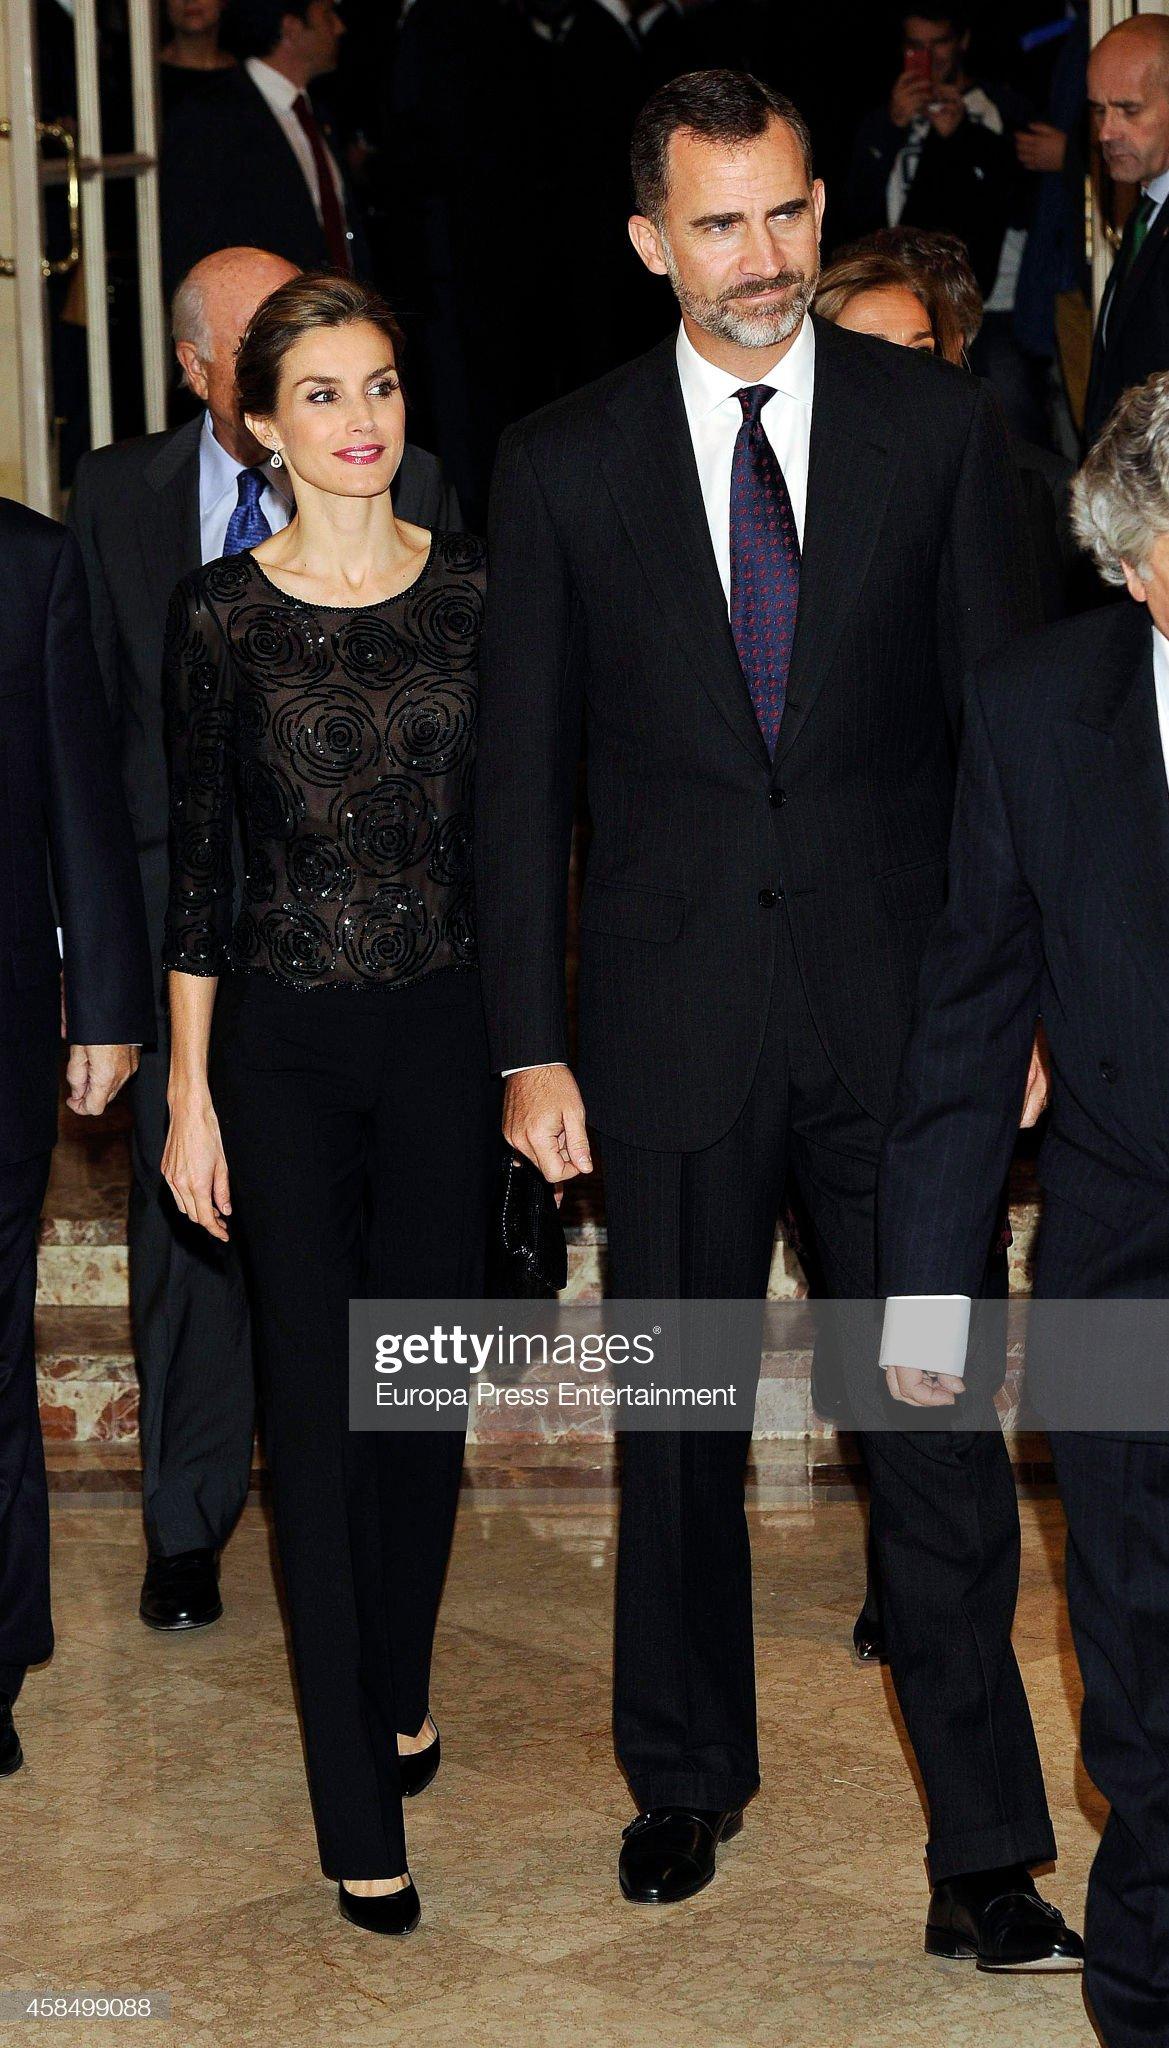 Spanish Royals Attend 'Francisco Cerecedo' Journalism Awards : News Photo